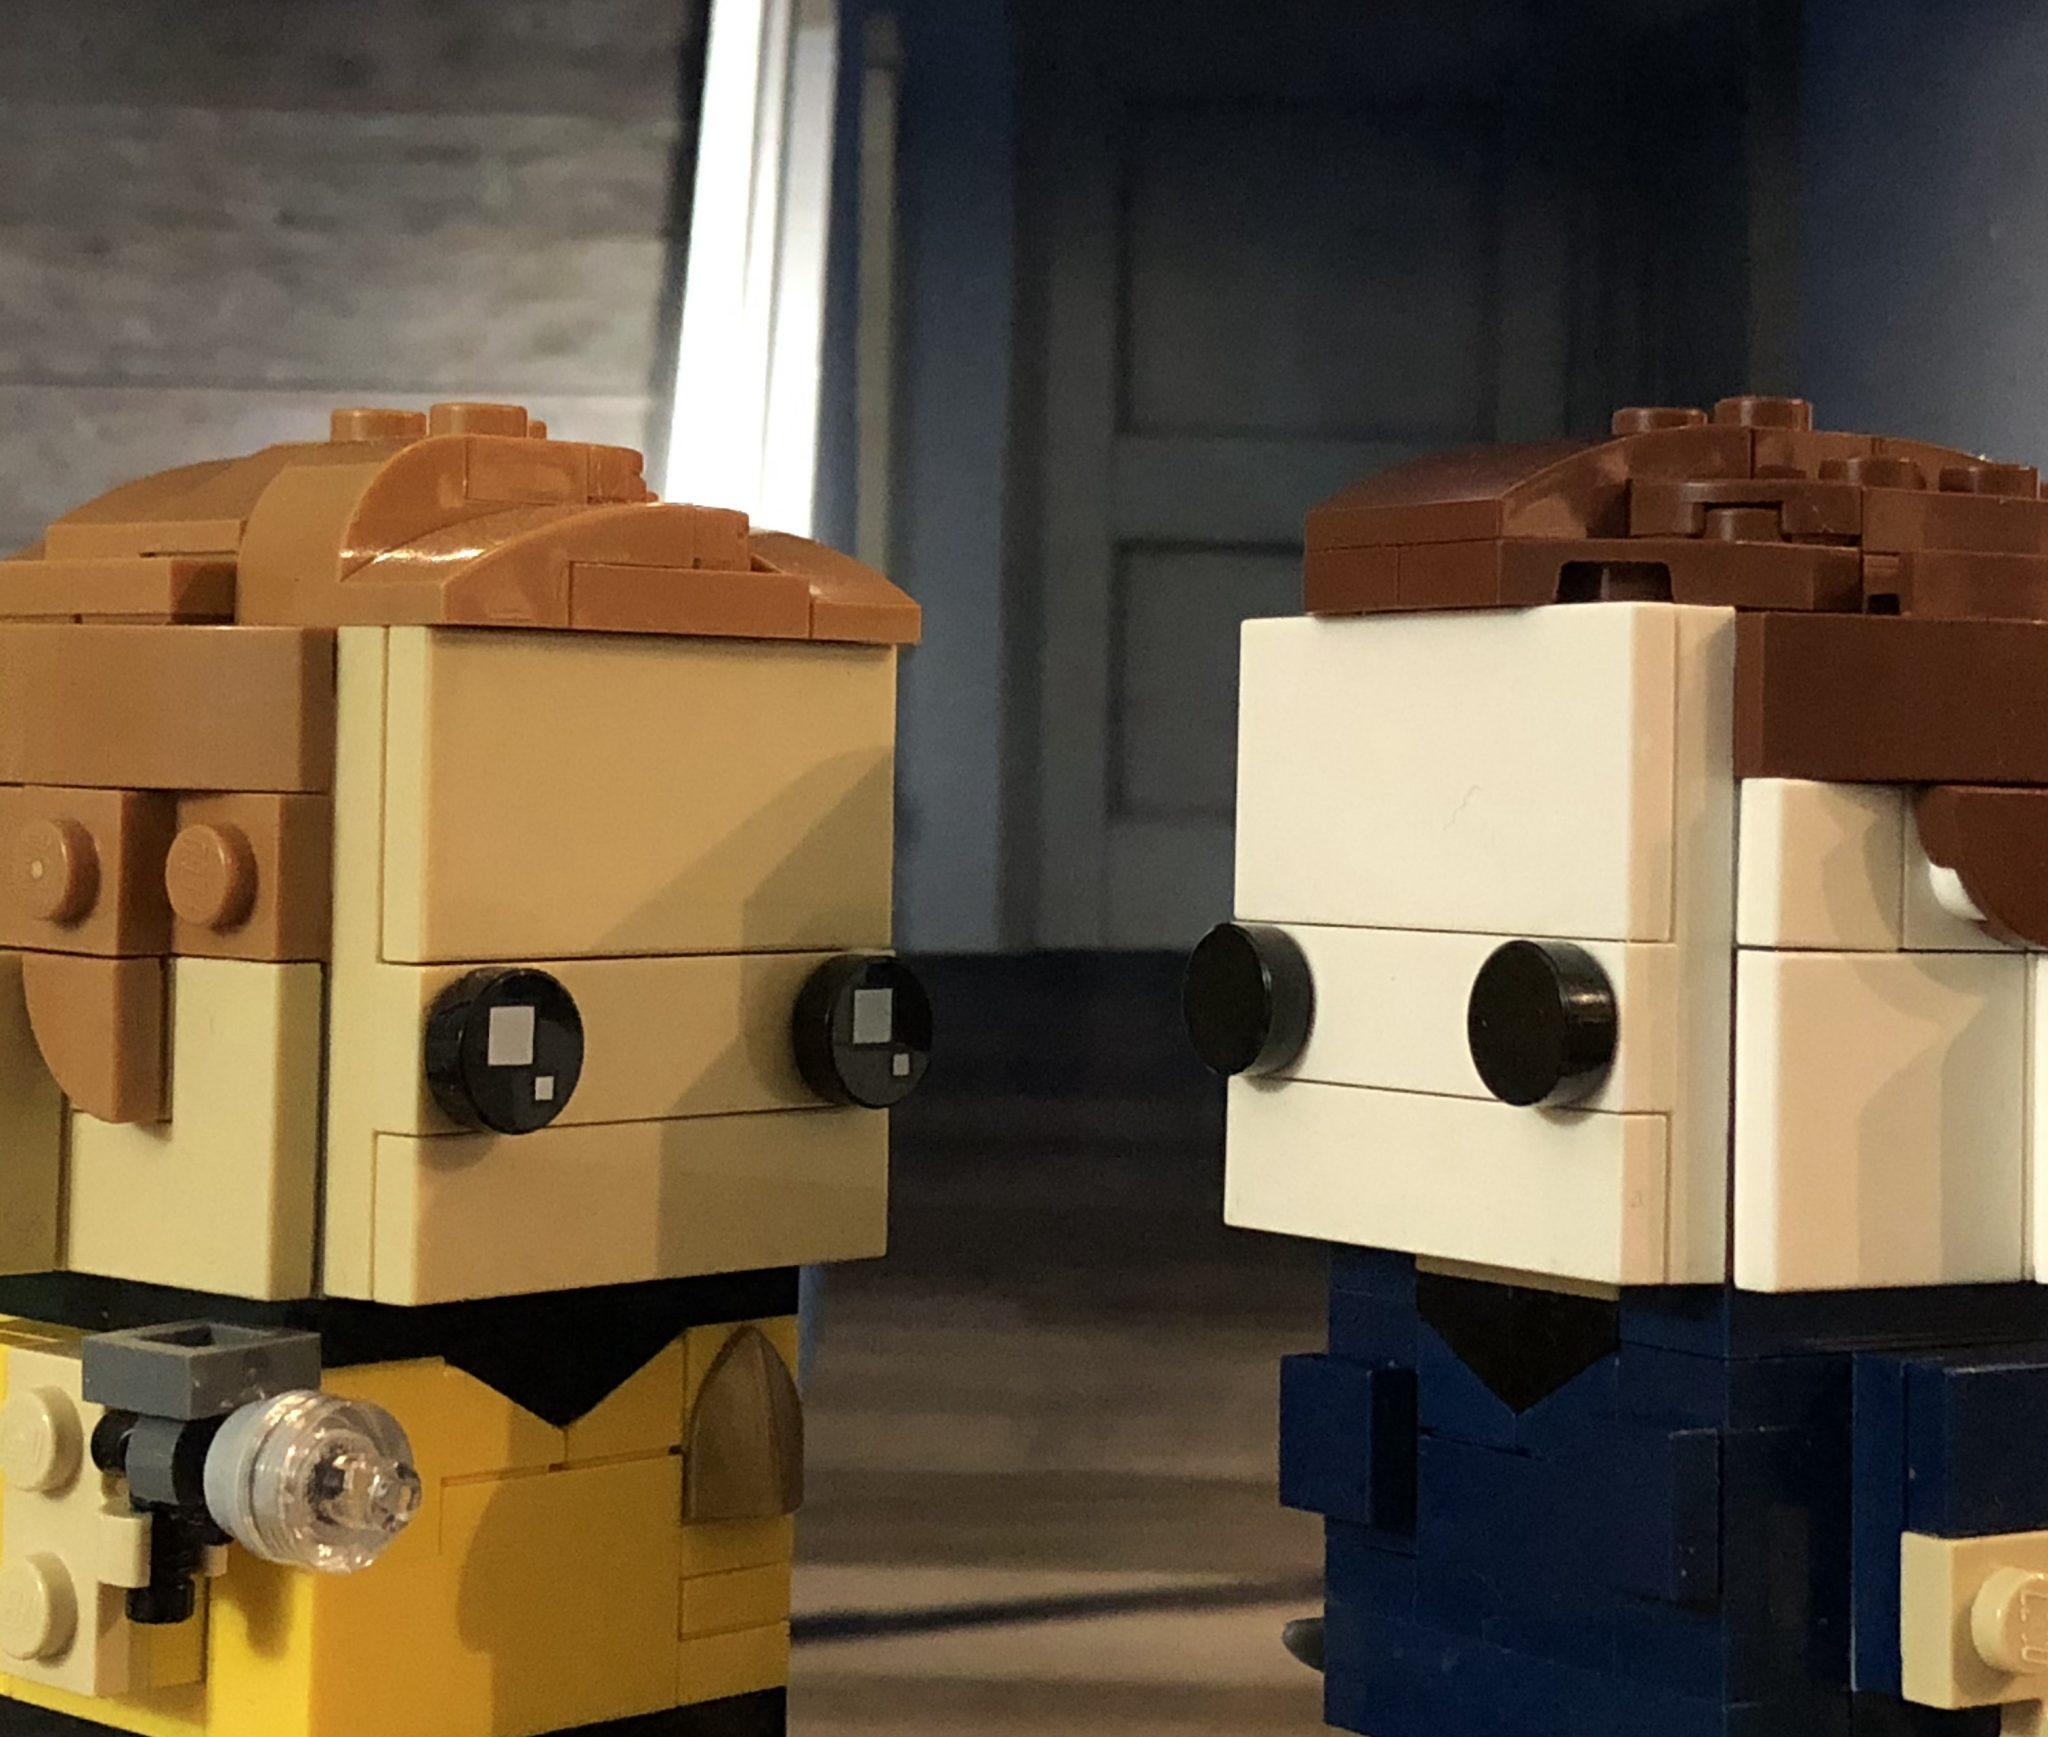 LEGO Brickheadz Theatre: Mirror, Mirror